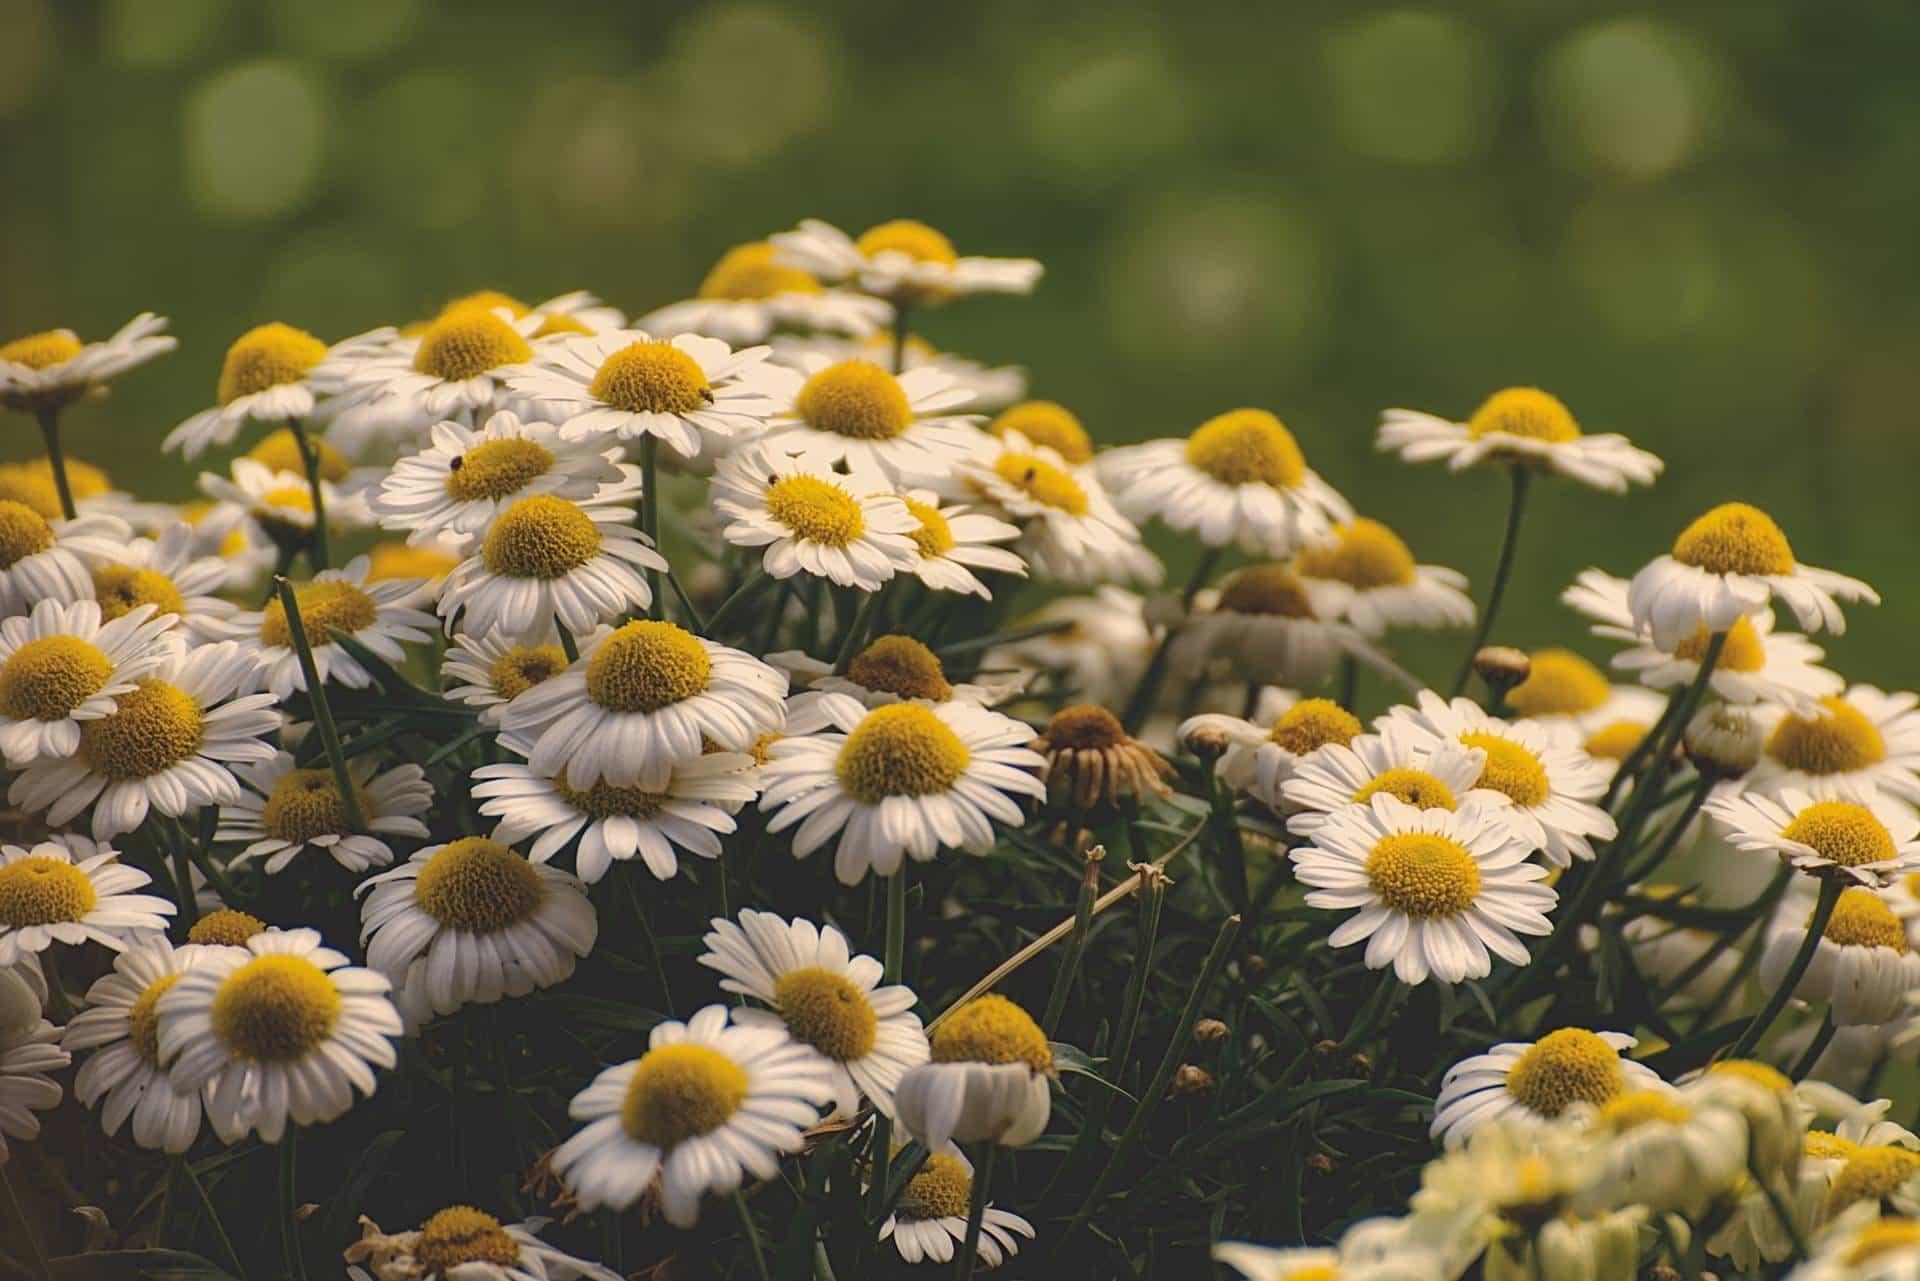 bush of blooming daisies